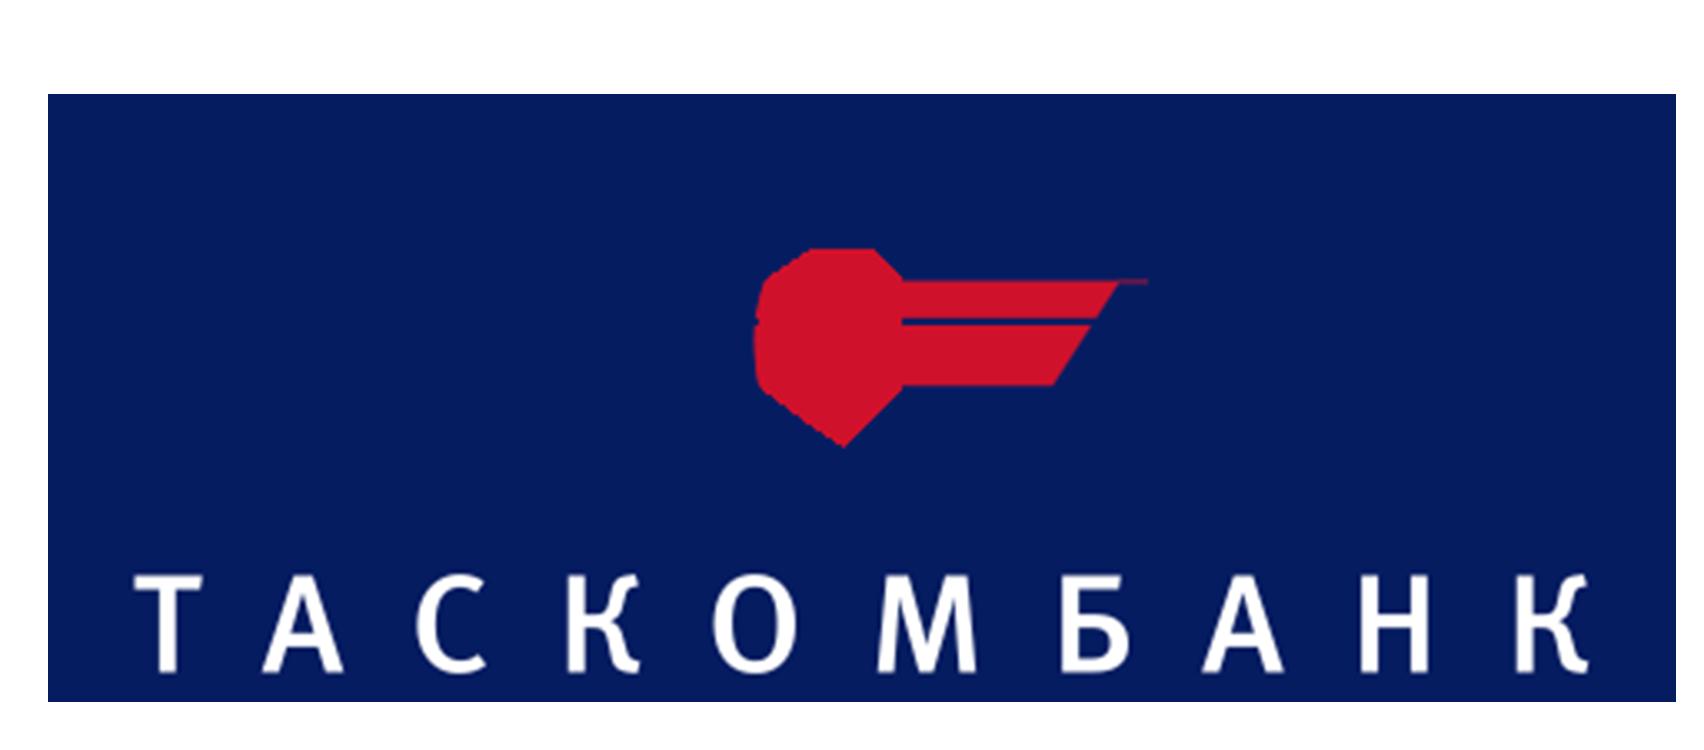 "ПАТ ""ТАСКОМБАНК""  (поповнення депозитного рахунку)"